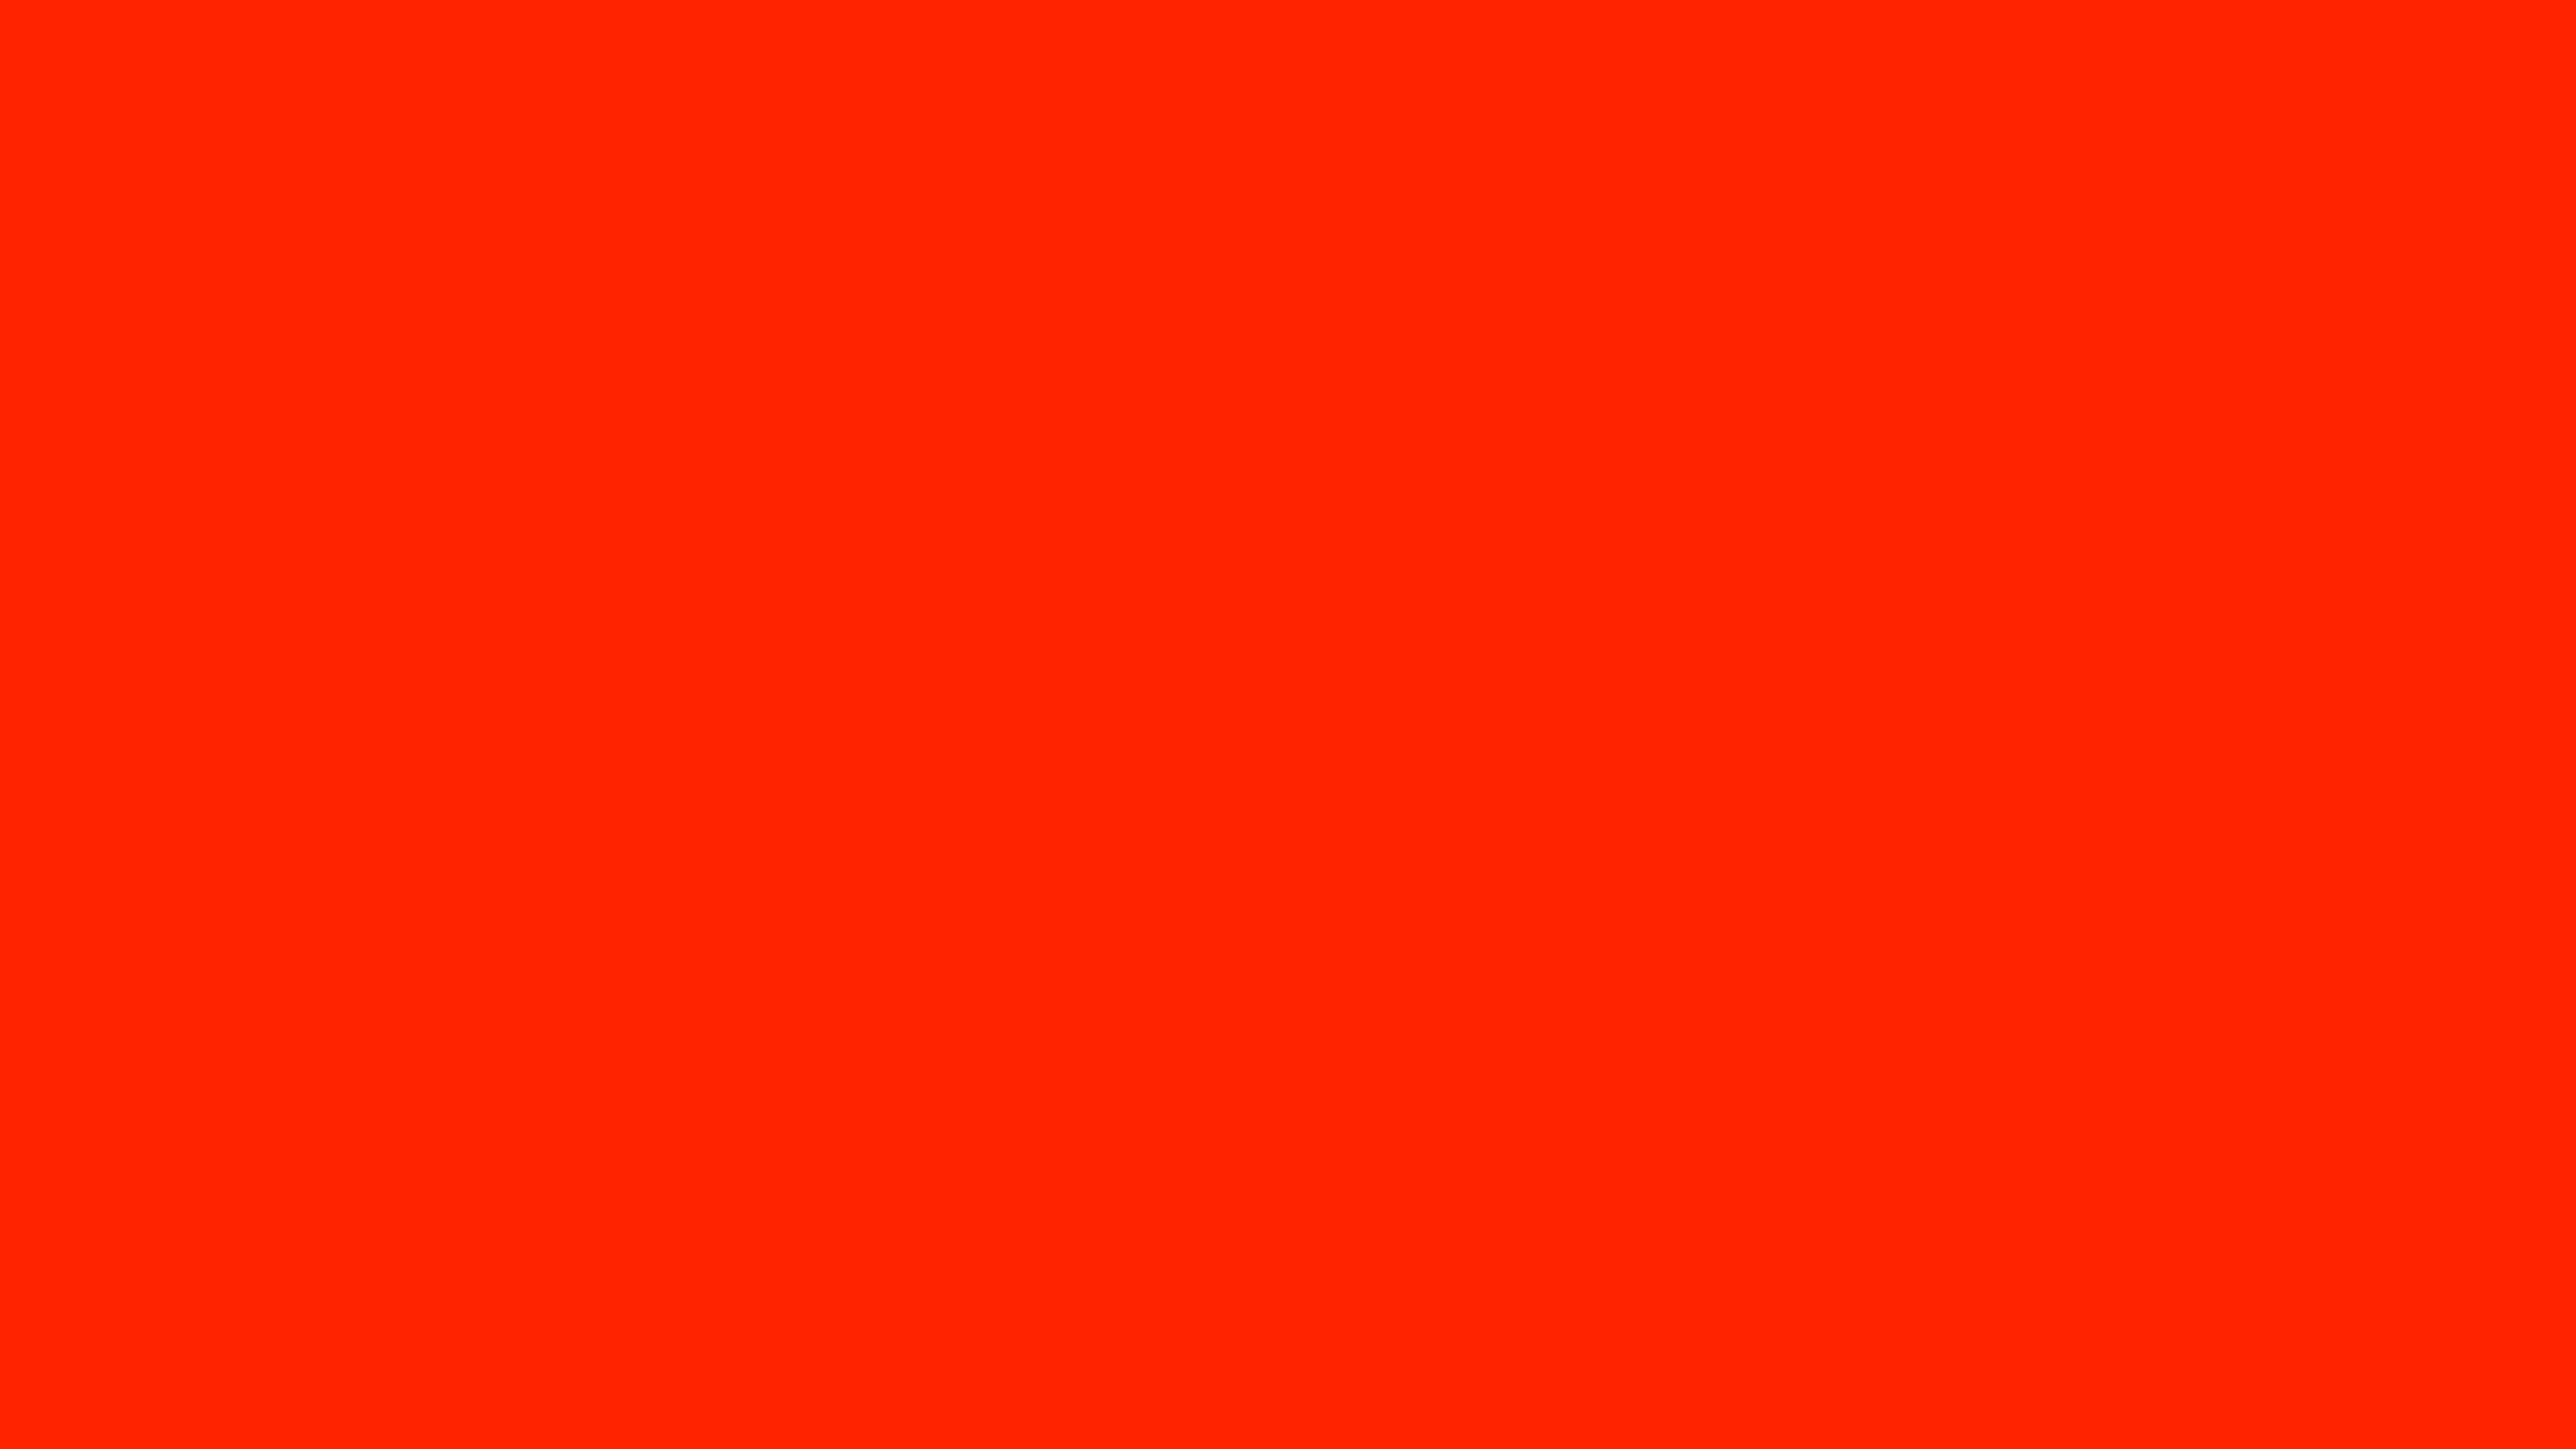 3840x2160 Scarlet Solid Color Background